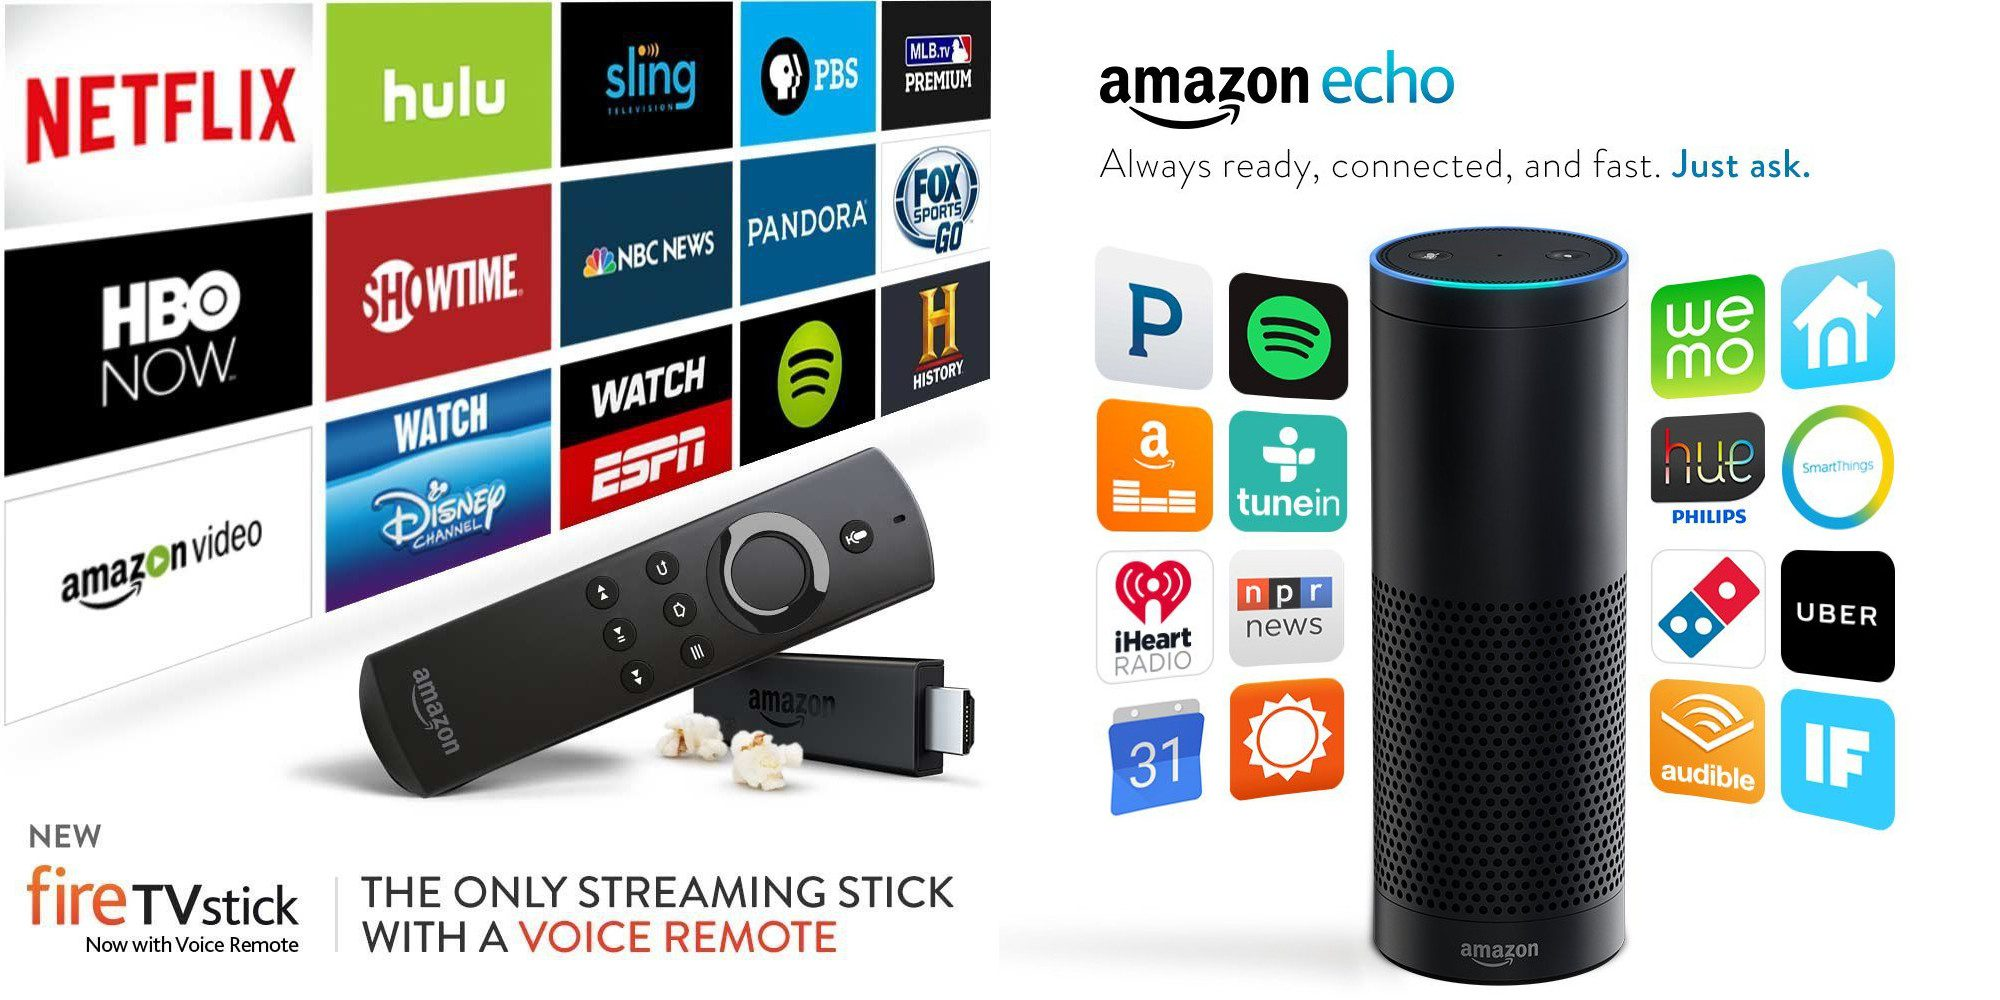 amazon-echo-fire-tv-stick-sale-01